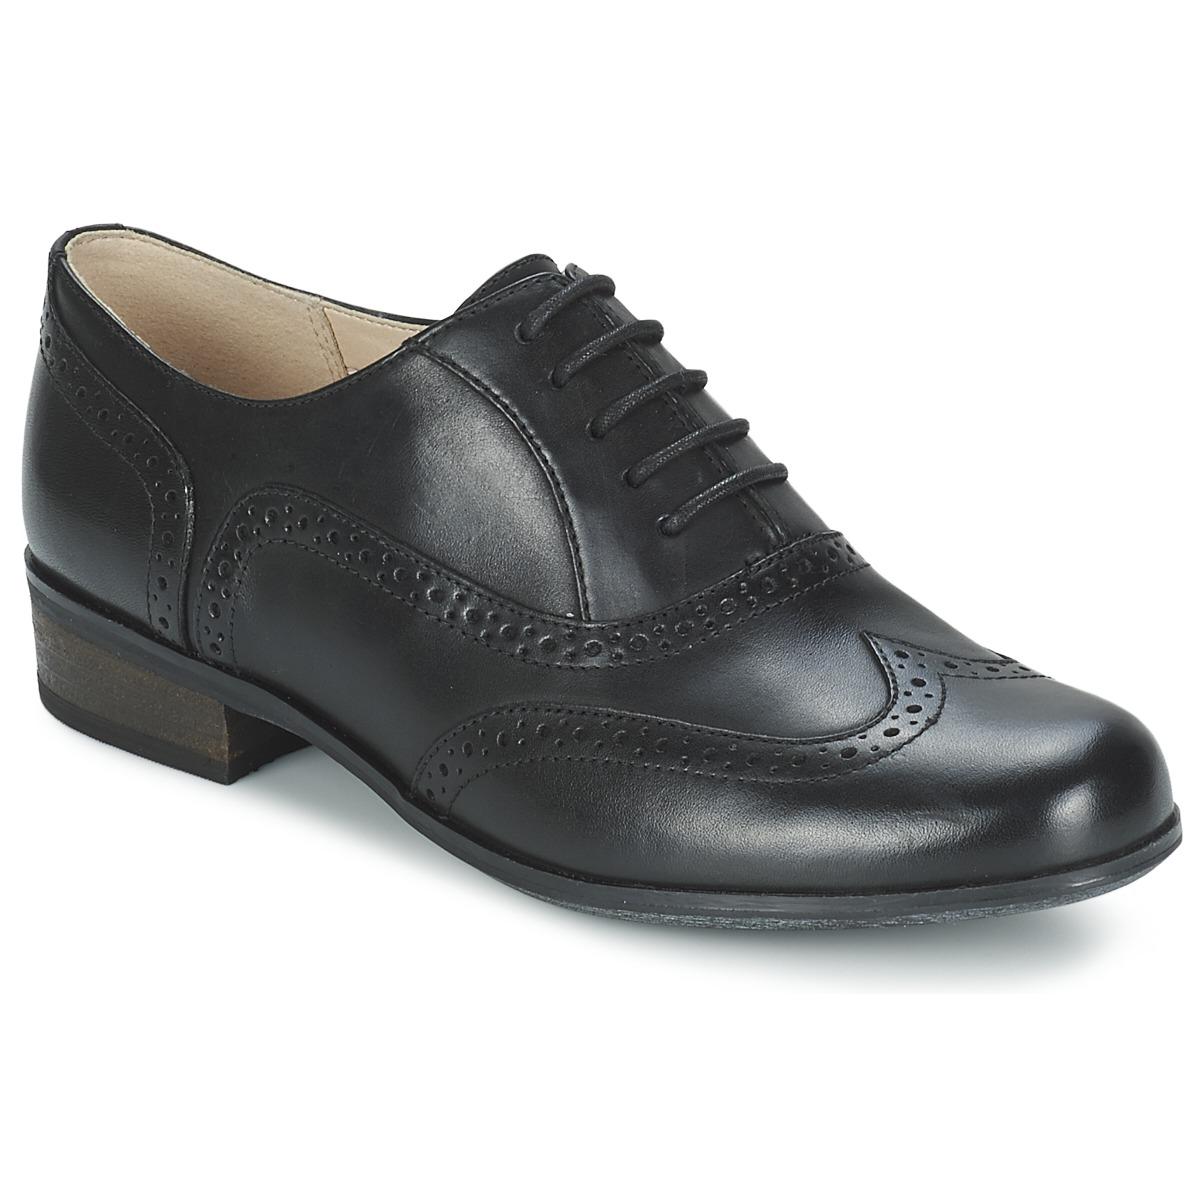 43c6f54d8c2 Clarks HAMBLE OAK Black Shoes Brogues Women 50%OFF - s132716079 ...